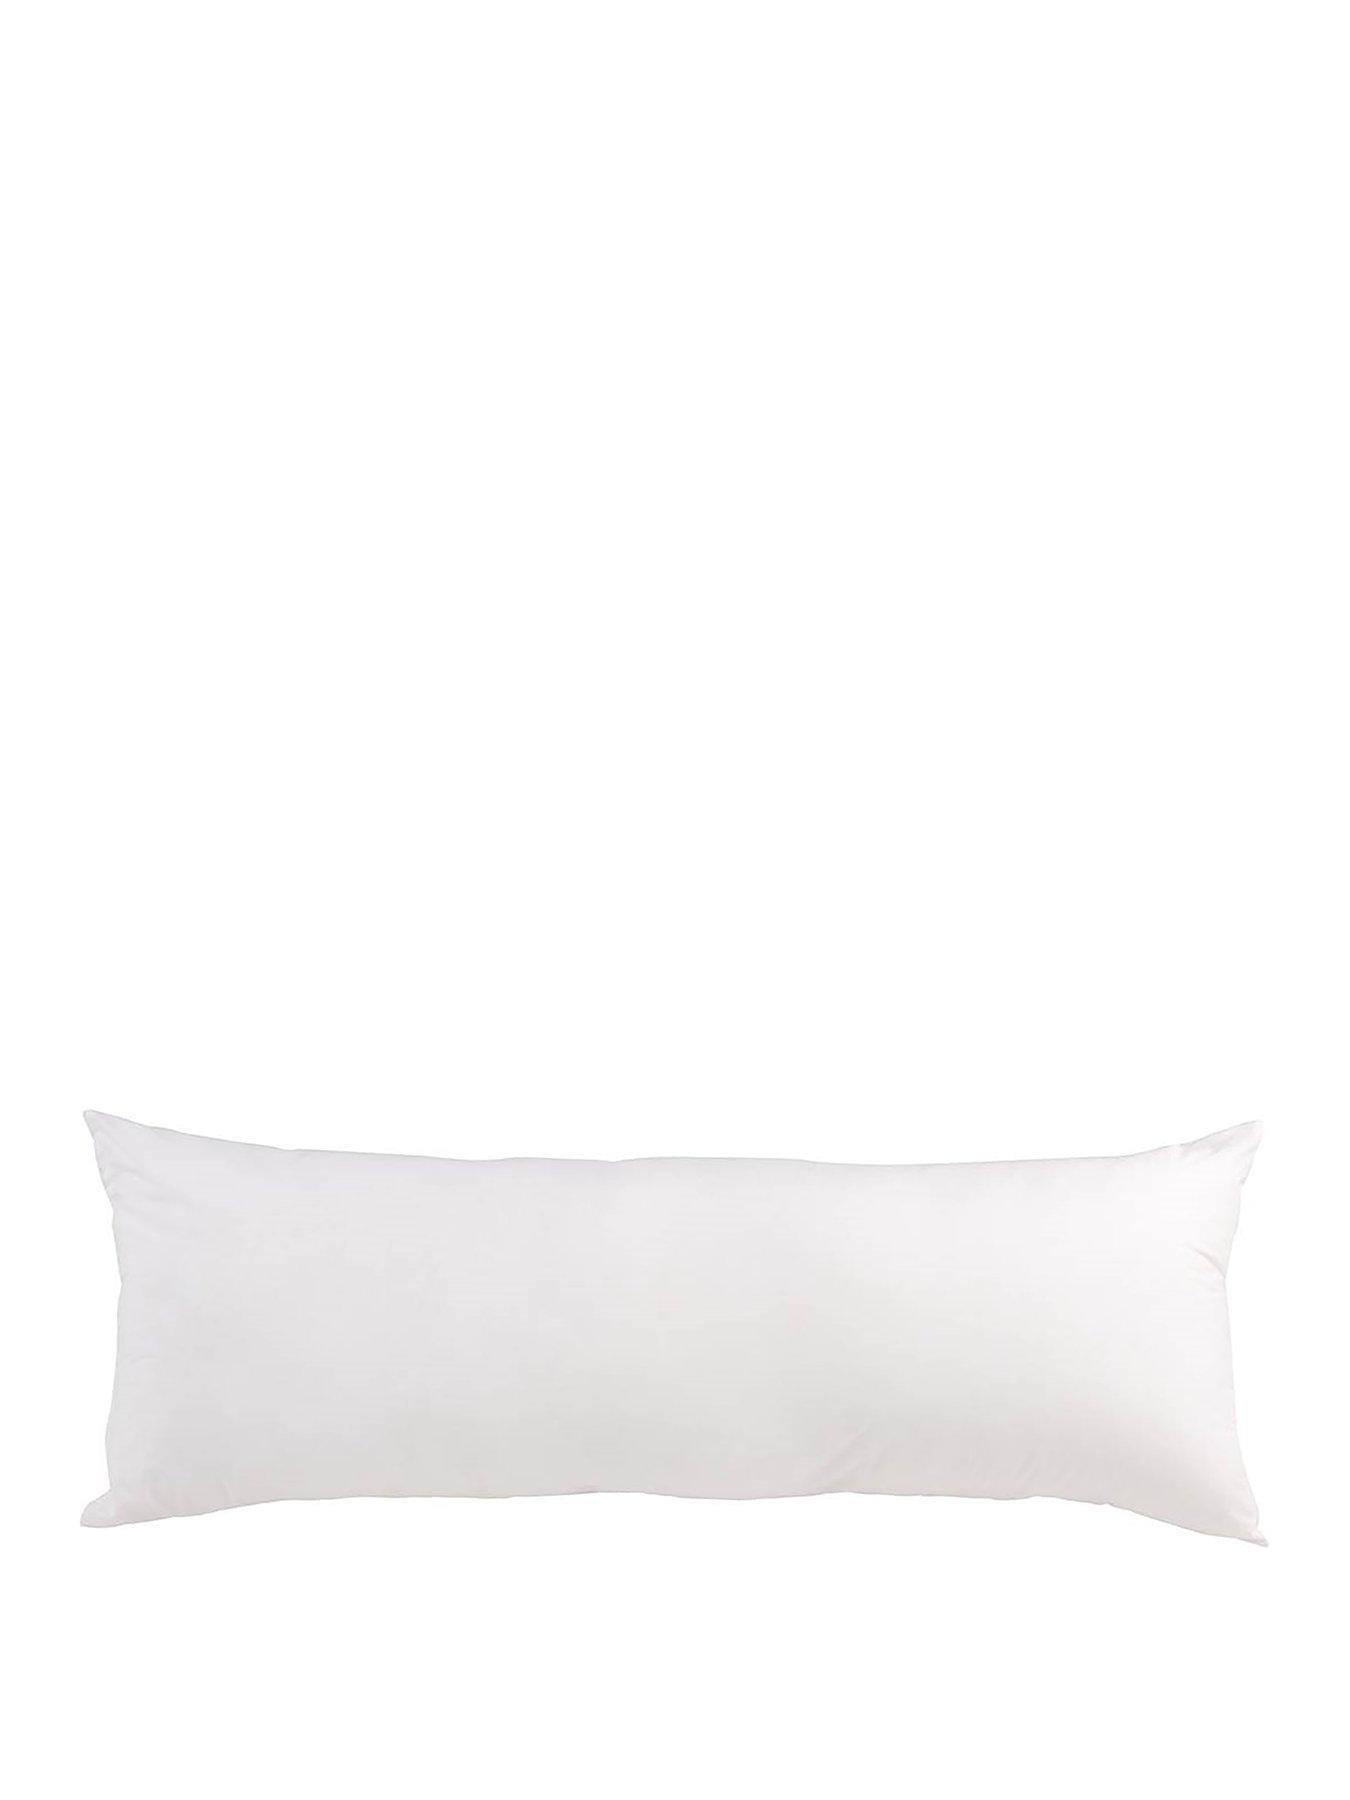 king size bolster pillow